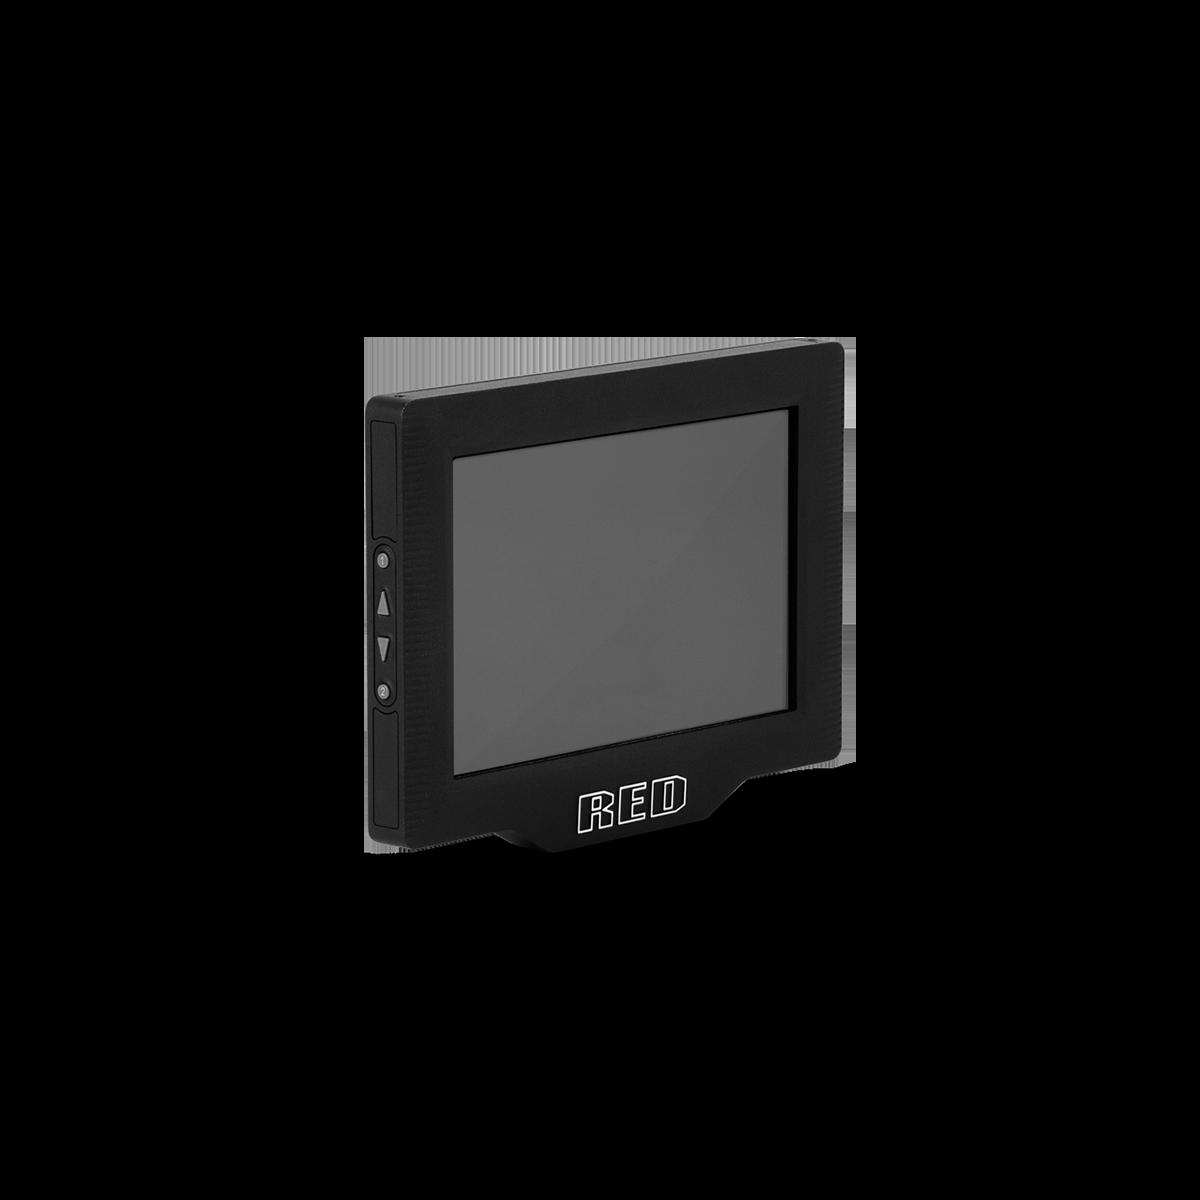 DSMC2 RED 7.0'' 专业超亮触控液晶屏